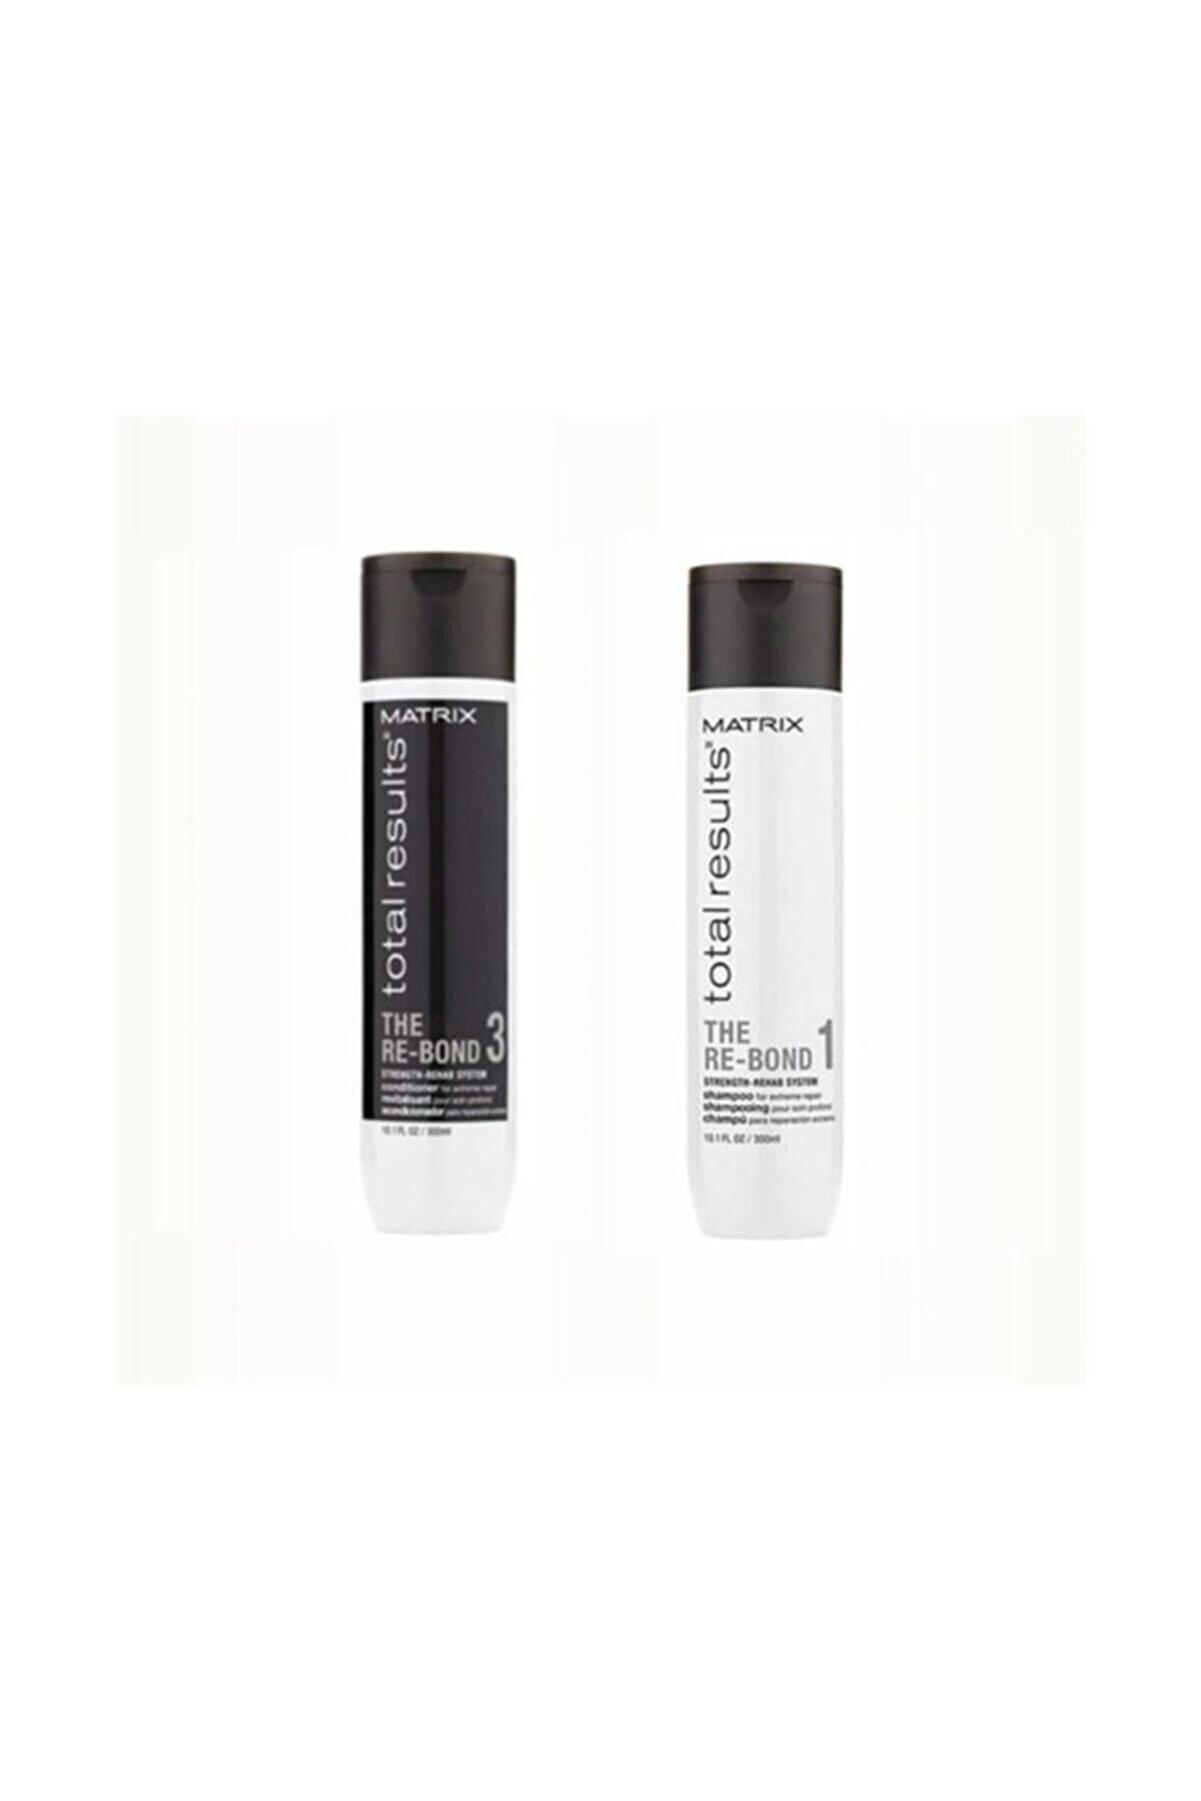 Matrix Total Re-bond Şampuan 300 Ml+ Saç Kremi 300 Ml